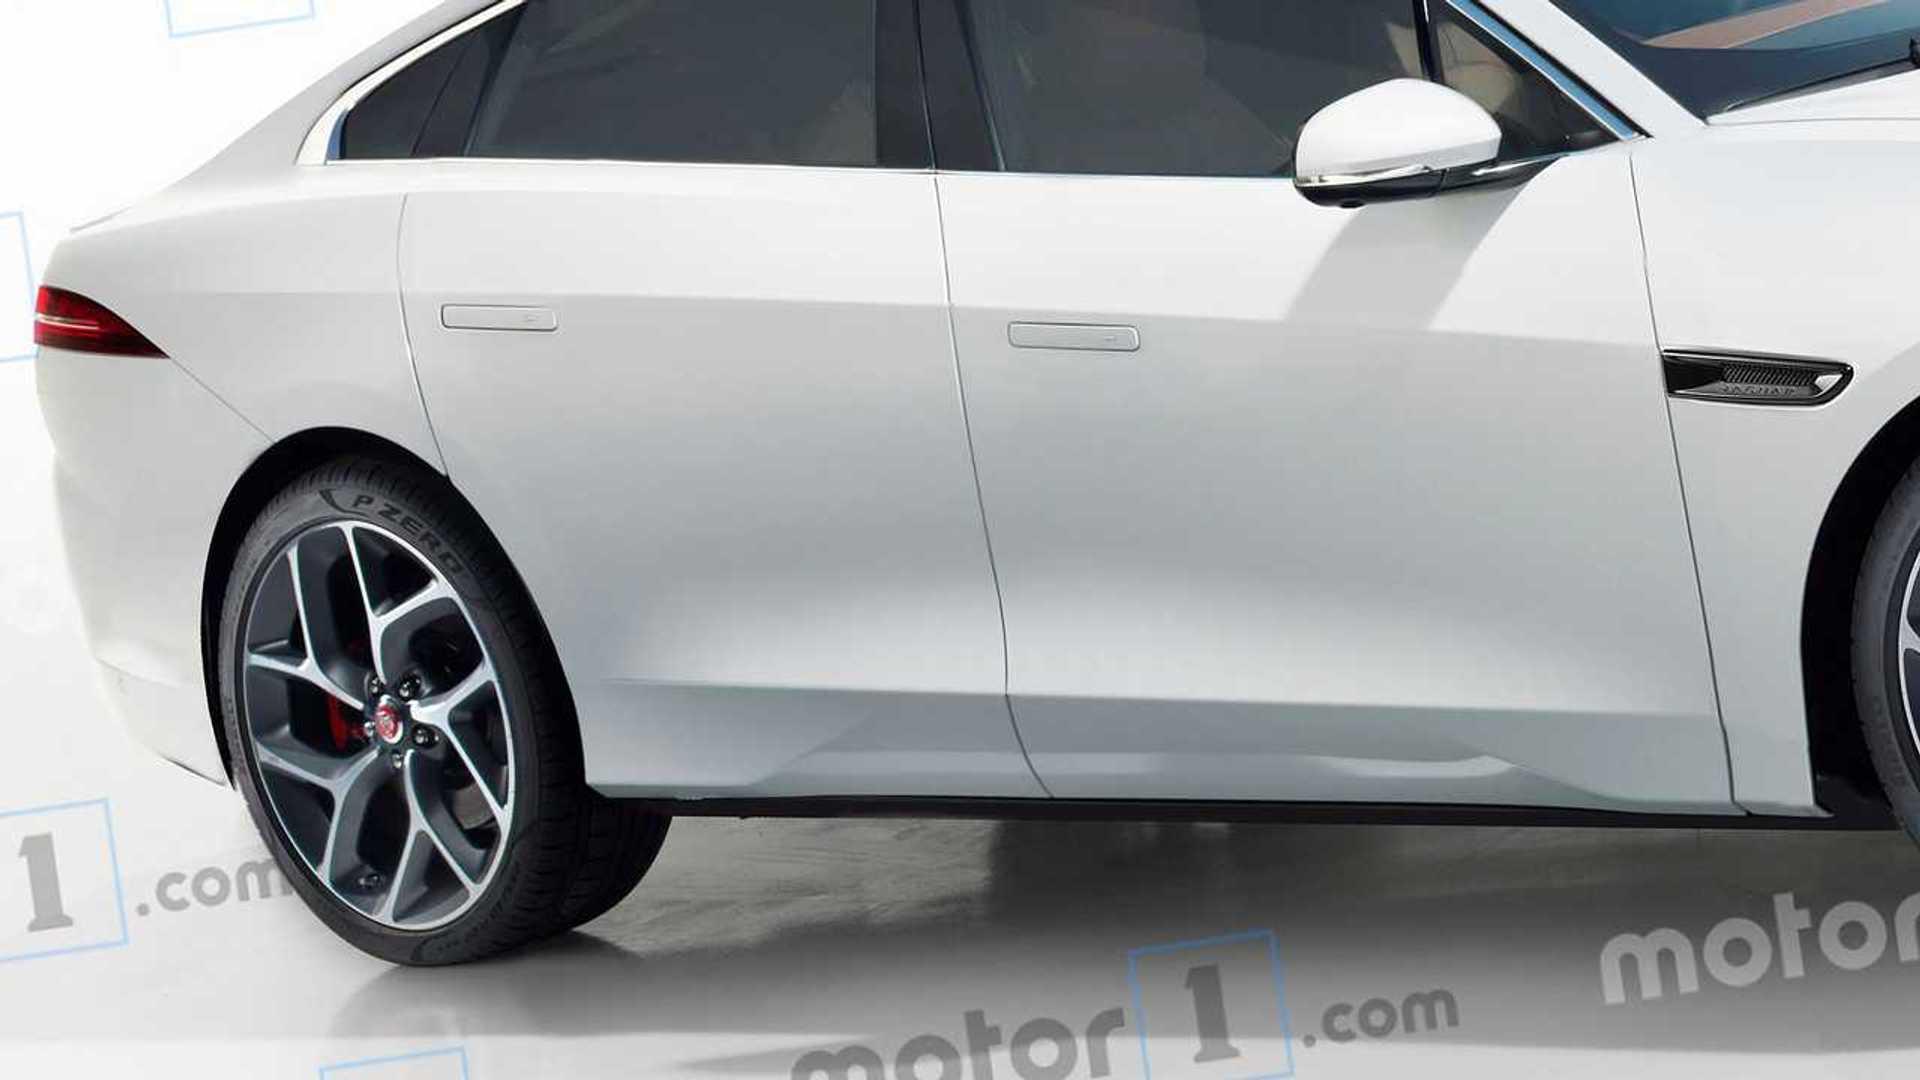 Jaguar Xj 2020 Tera Versao Eletrica Para Encarar Tesla Model S E Audi E Tron